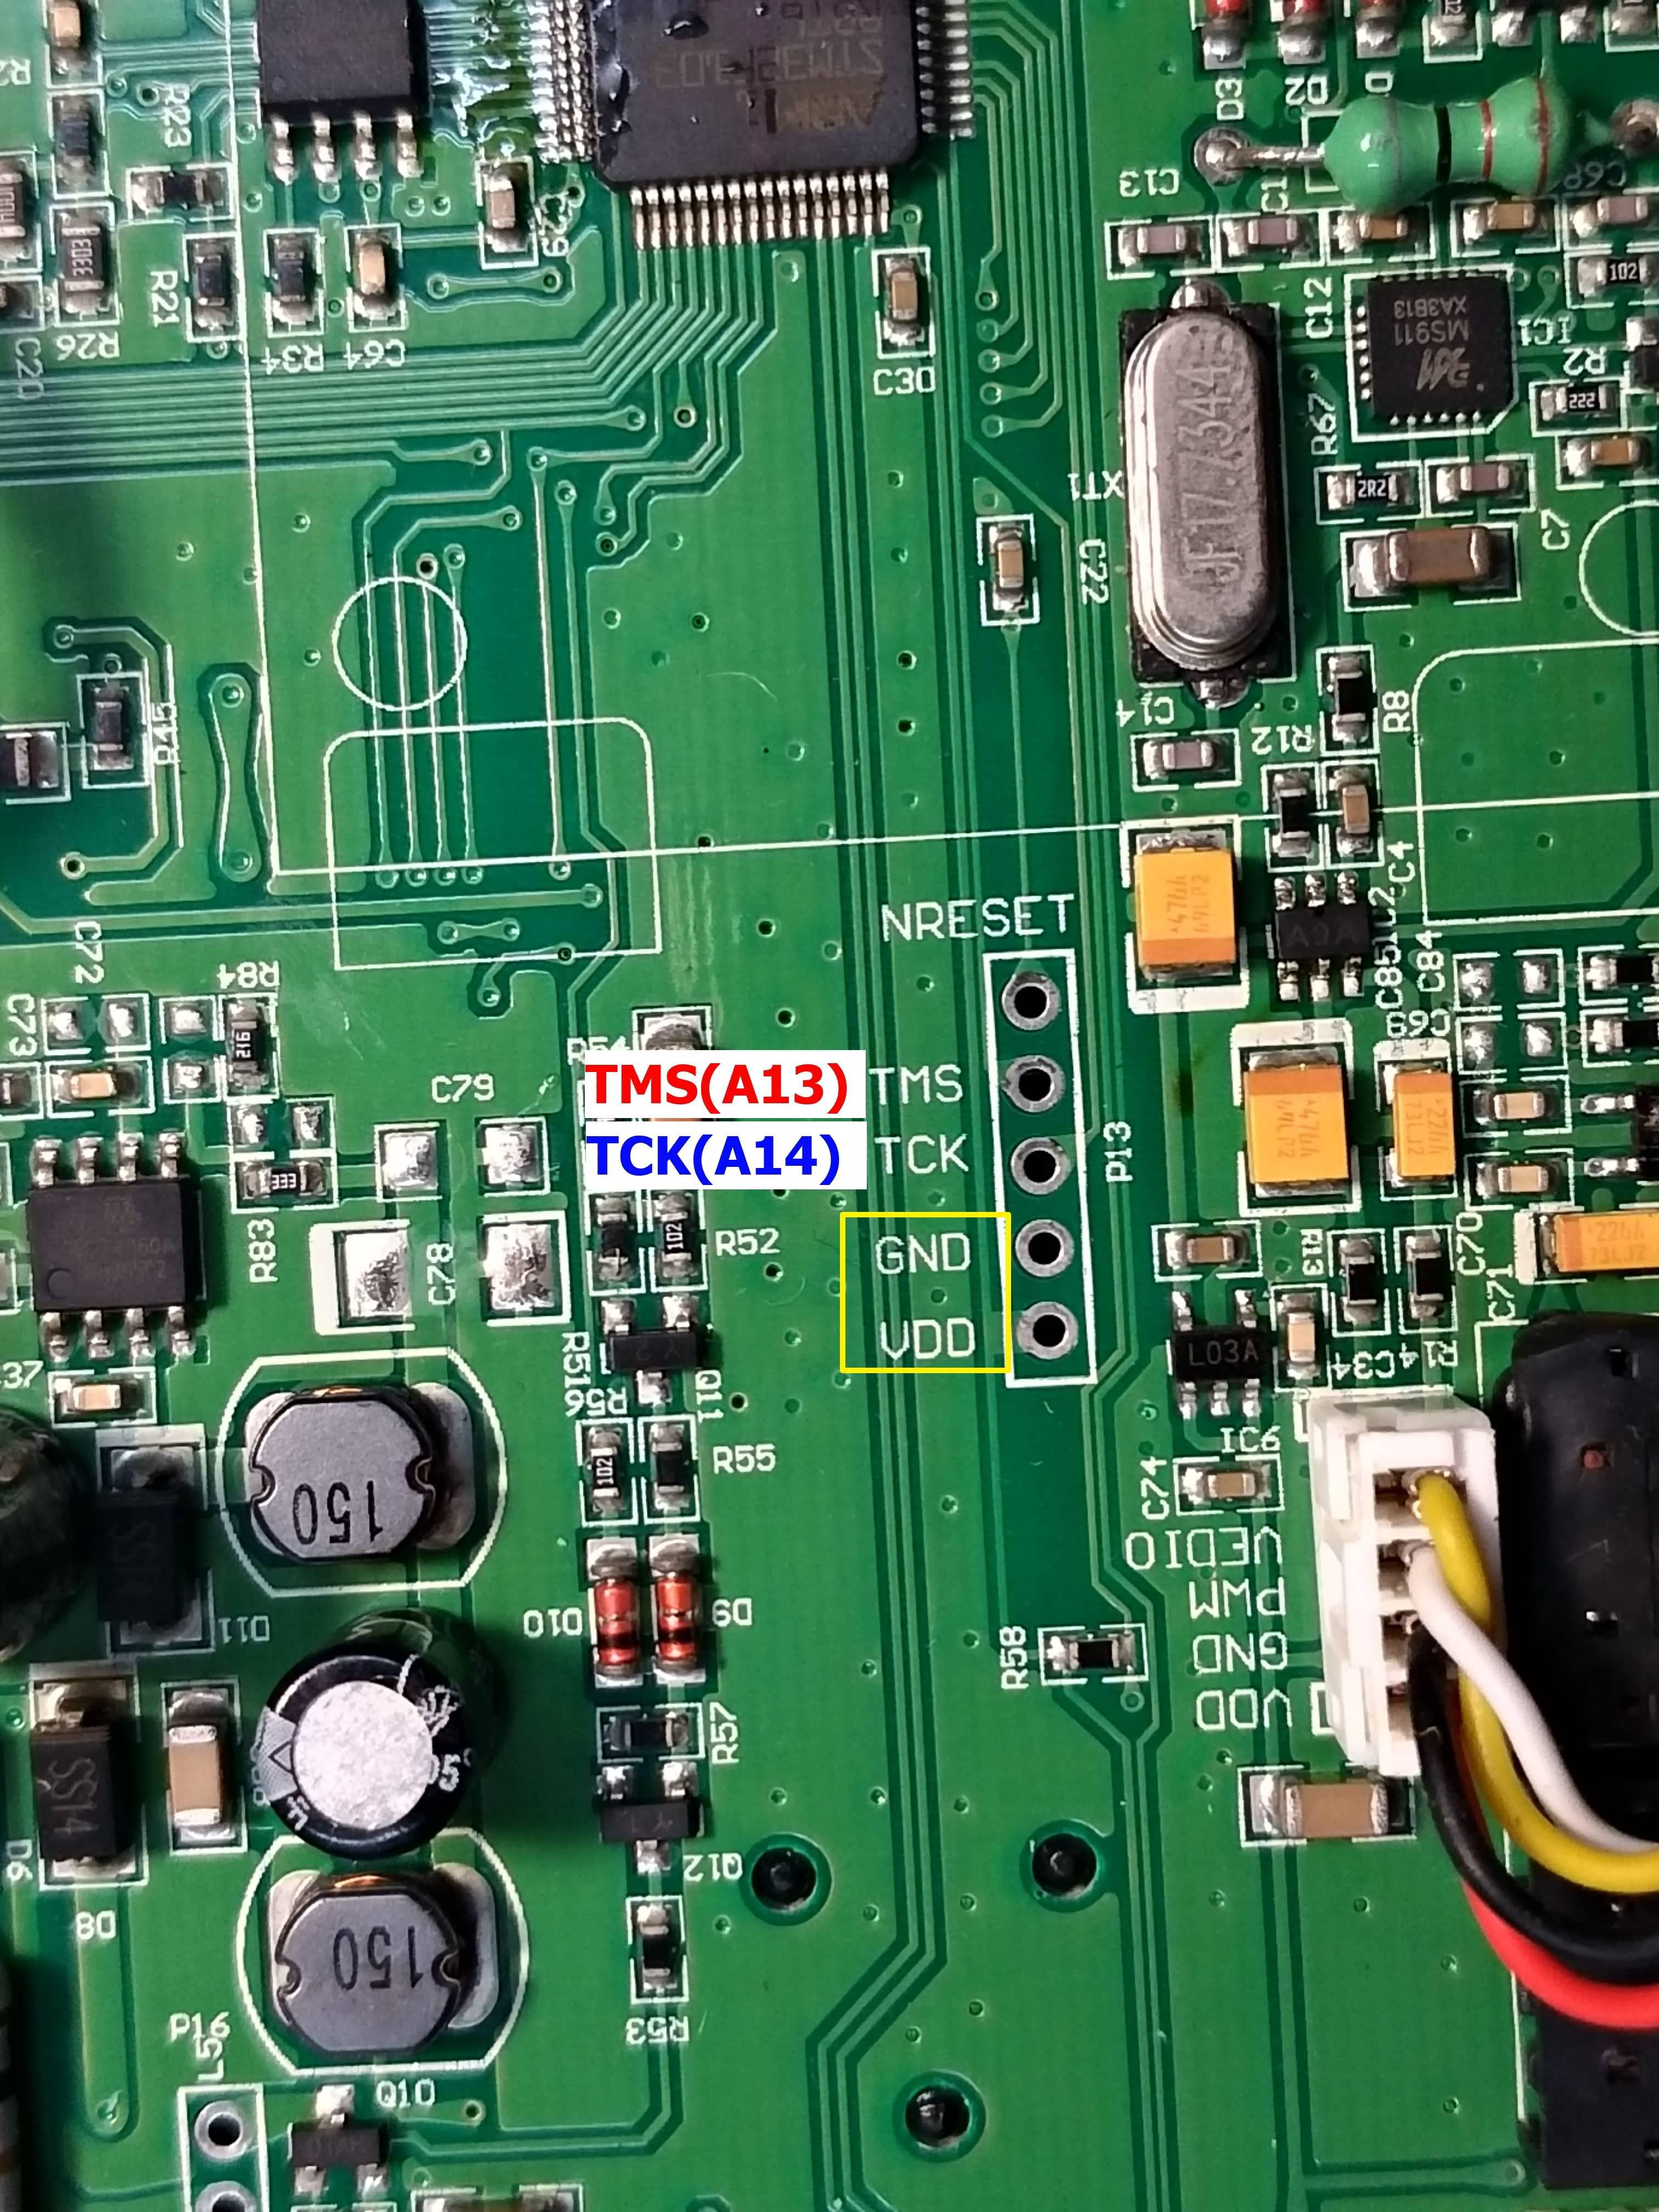 MOD-DG60-V1 for RMA Use 16bit to 24bit